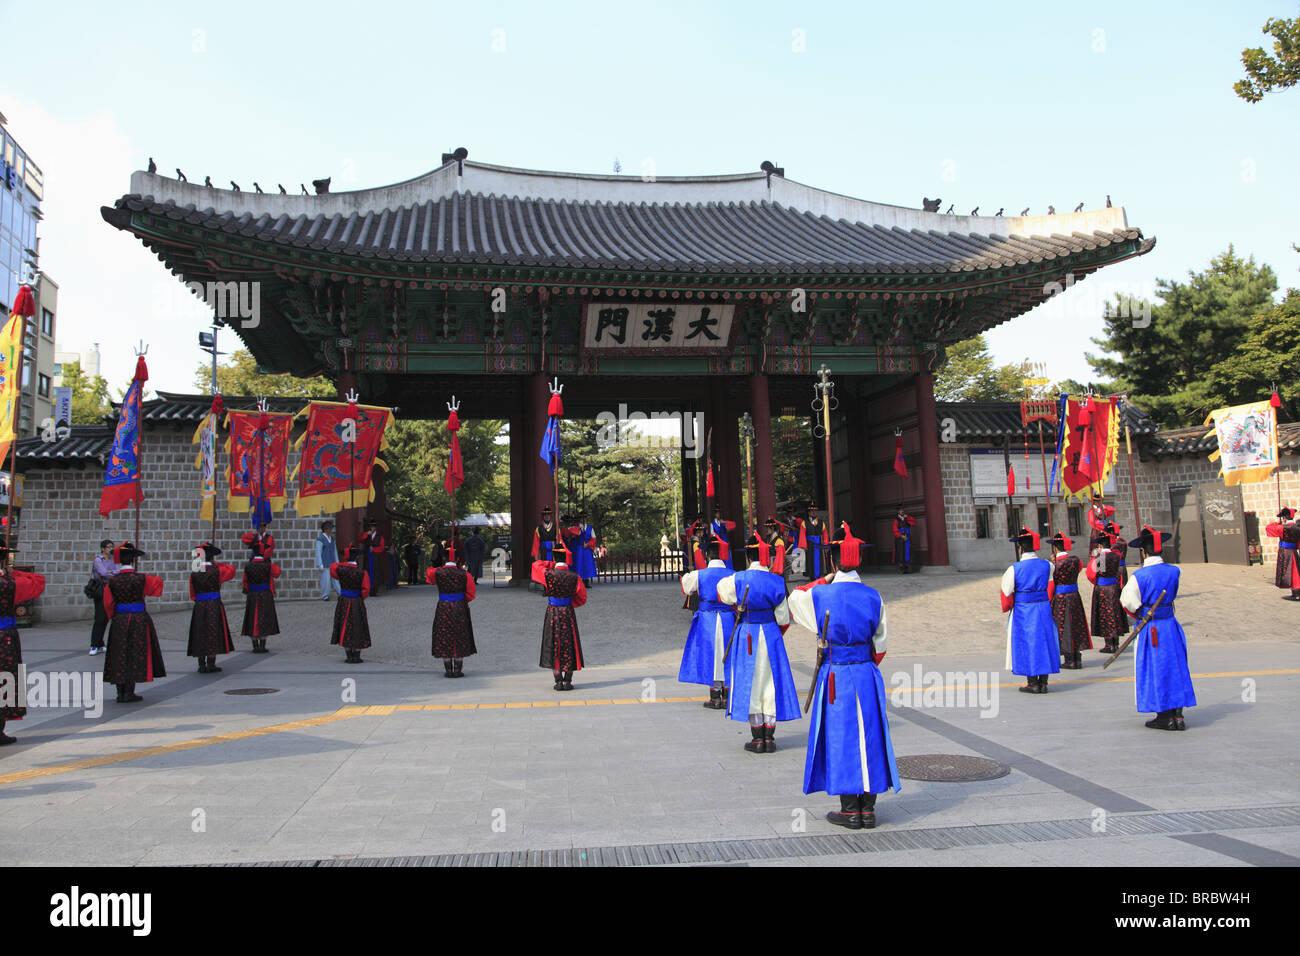 Changing of the Guards, Deoksugung Palace (Palace of Virtuous Longevity), Seoul, South Korea Stock Photo